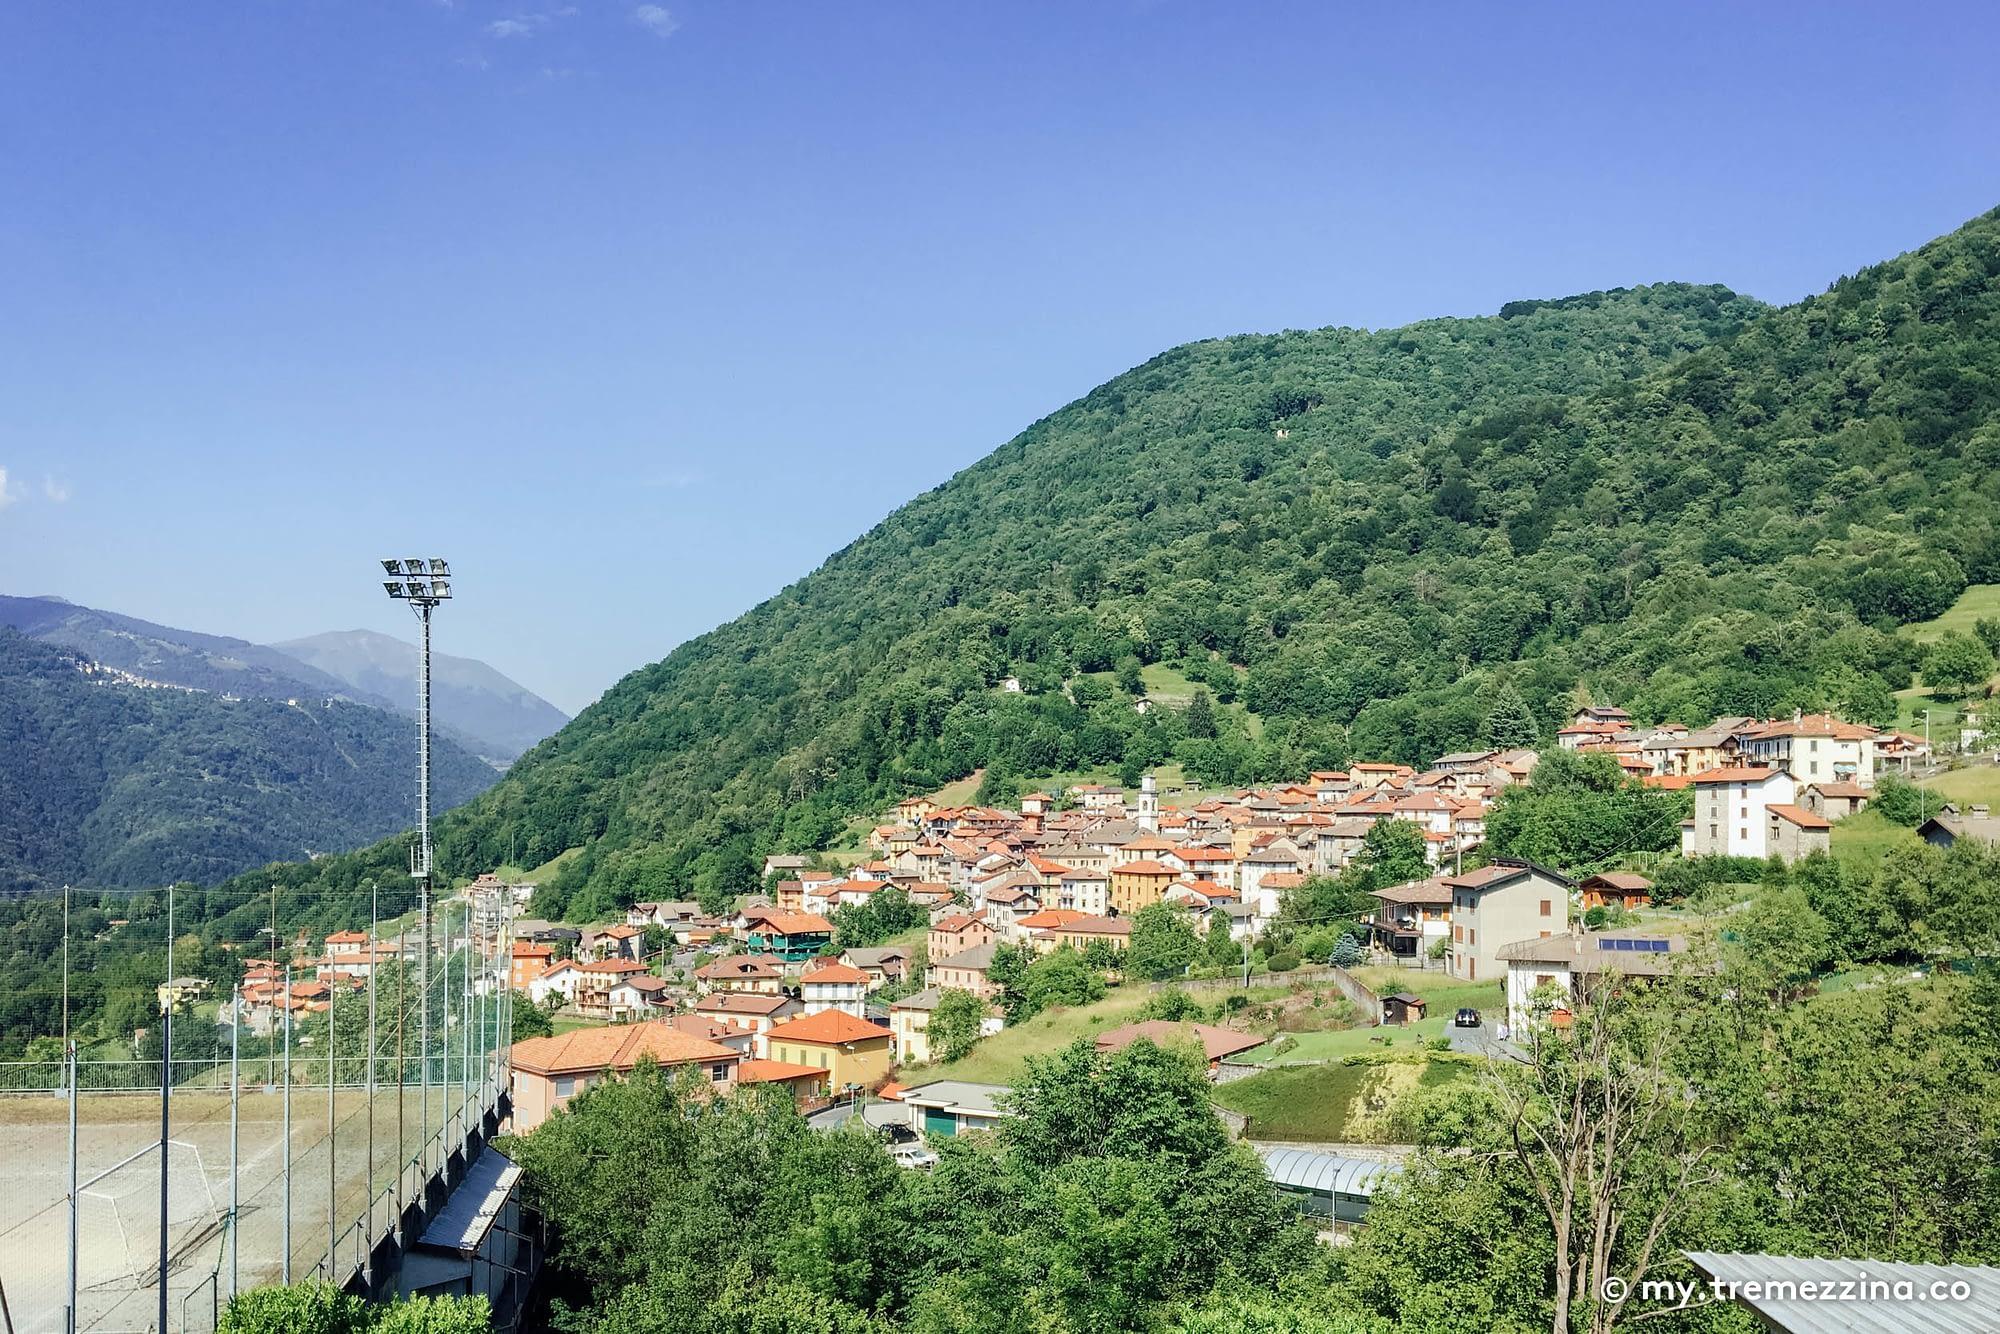 Schignano - Val d'Intelvi